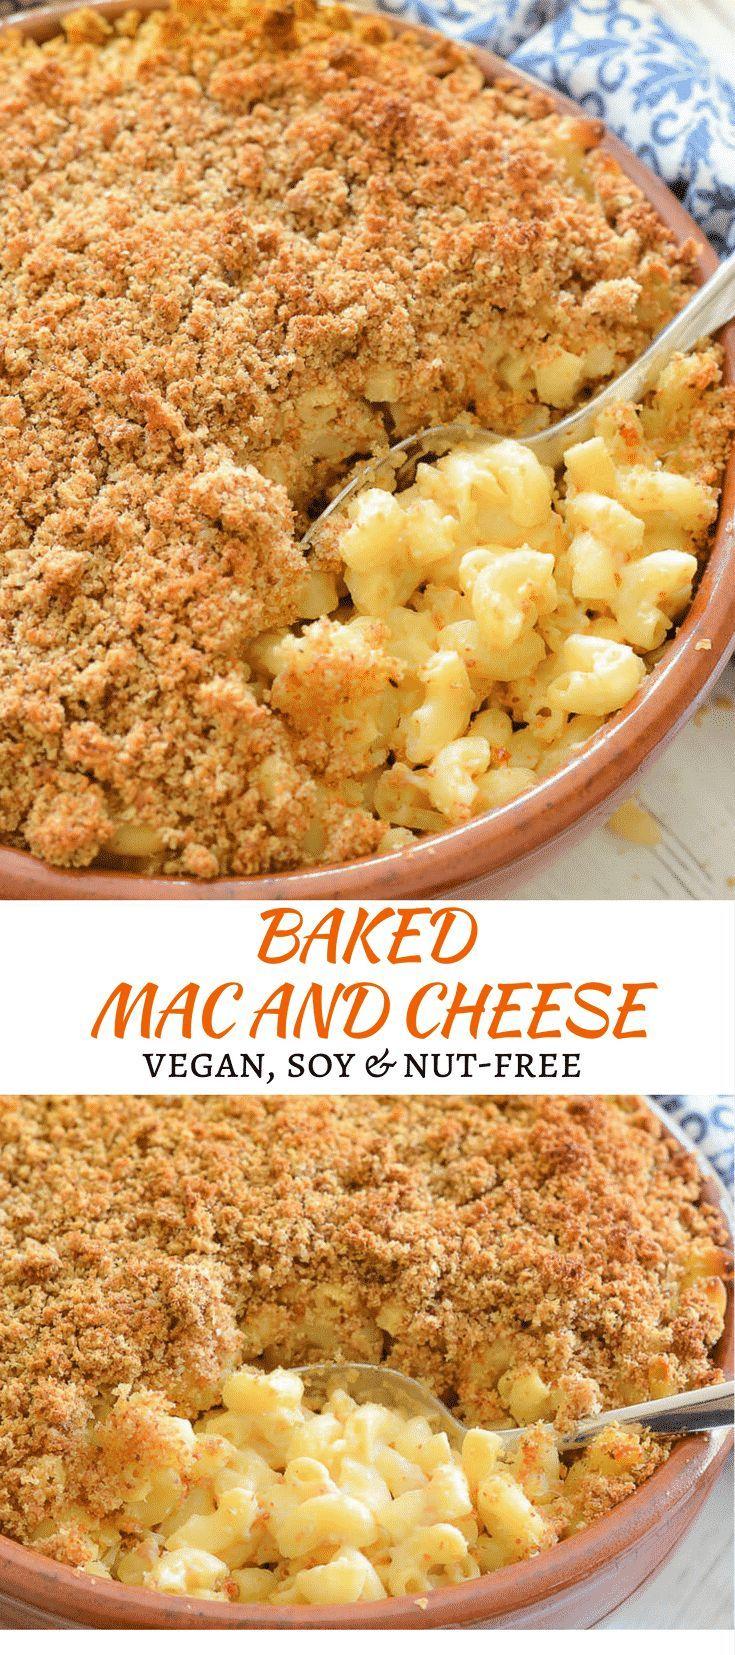 Baked Vegan Mac And Cheese Recipe Vegan Dinner Recipes Vegan